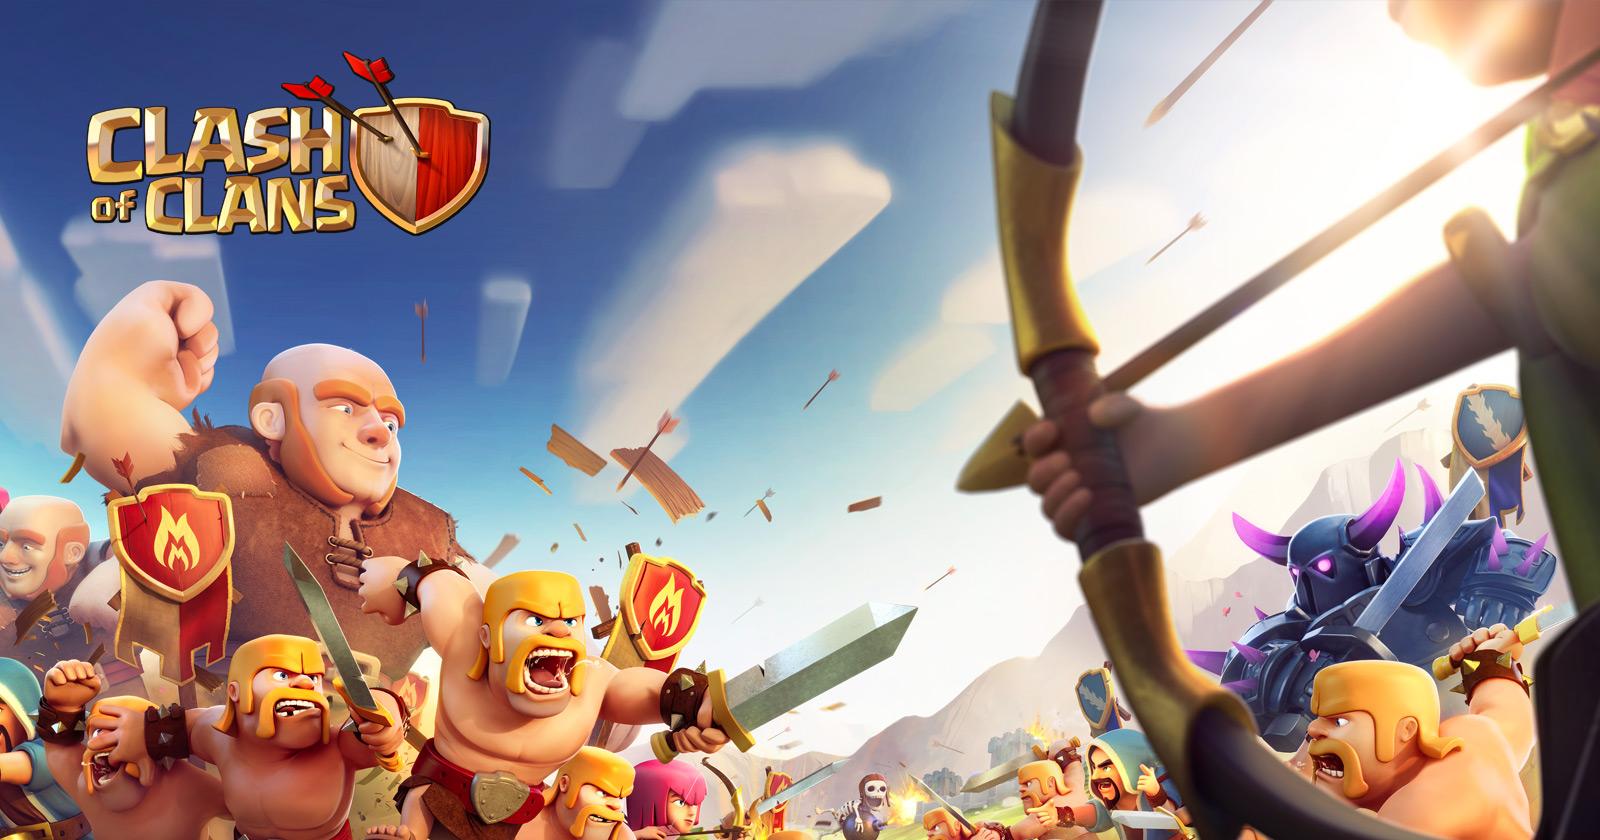 Download Clash of Clans 9.24.1 APK